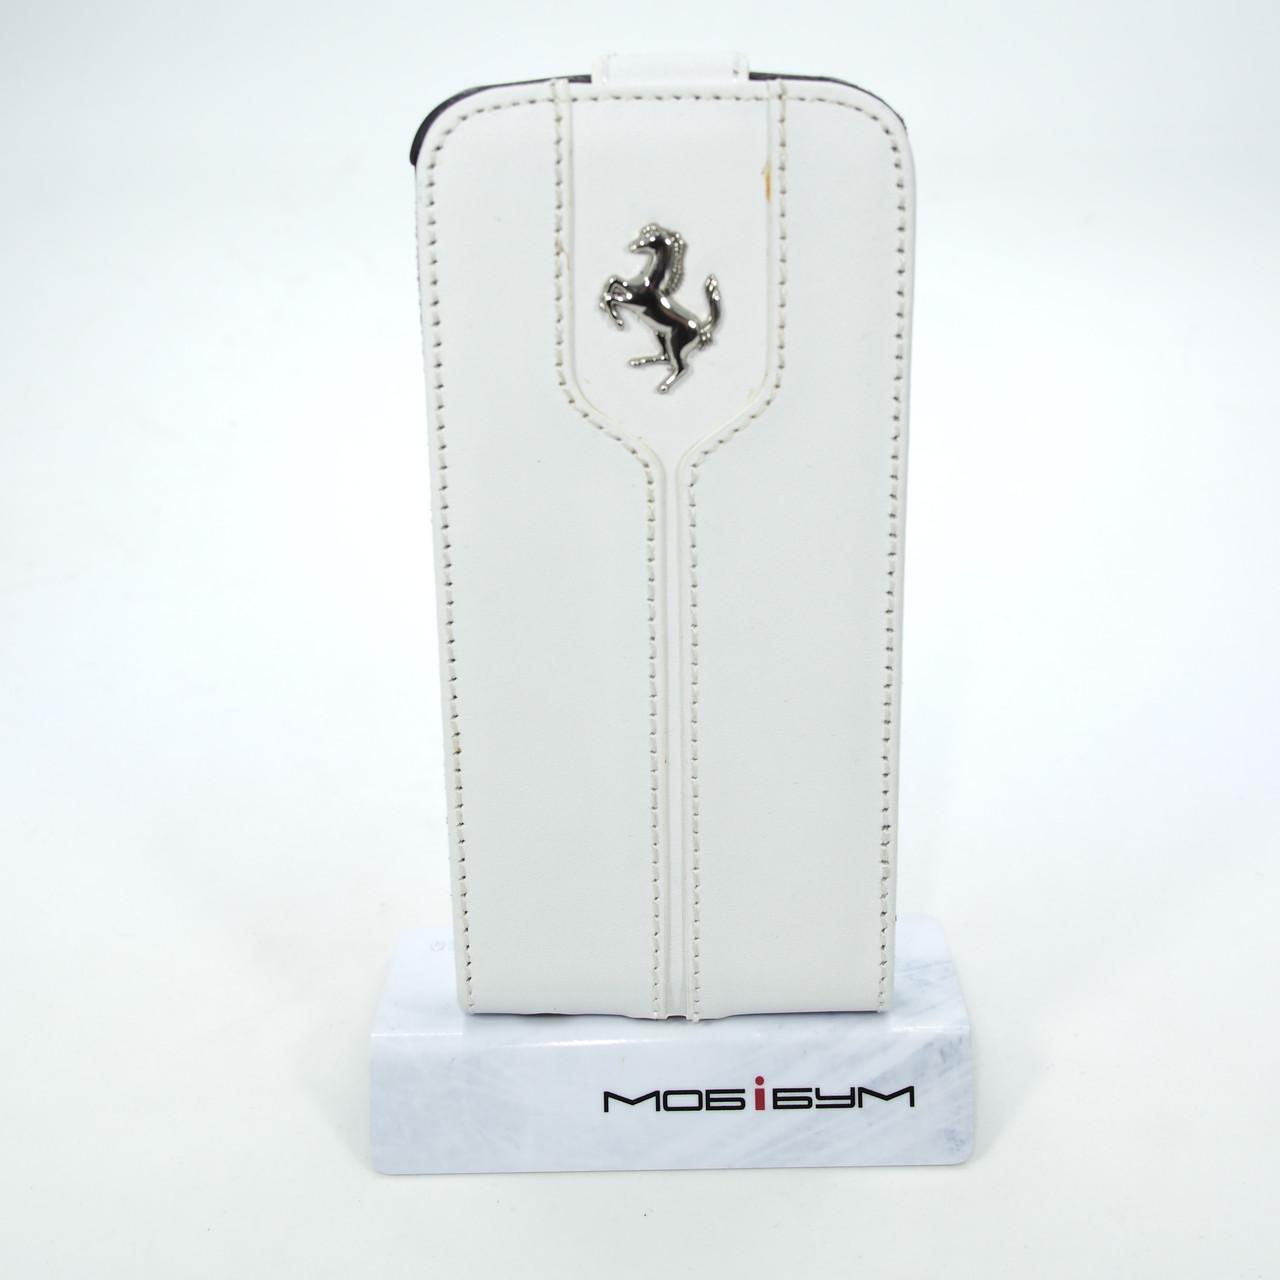 Чехол Ferrari Leather Flip Montecarlo iPhone 5s/SE white (FEMTFLP5WH) EAN/UPC: 370074031459